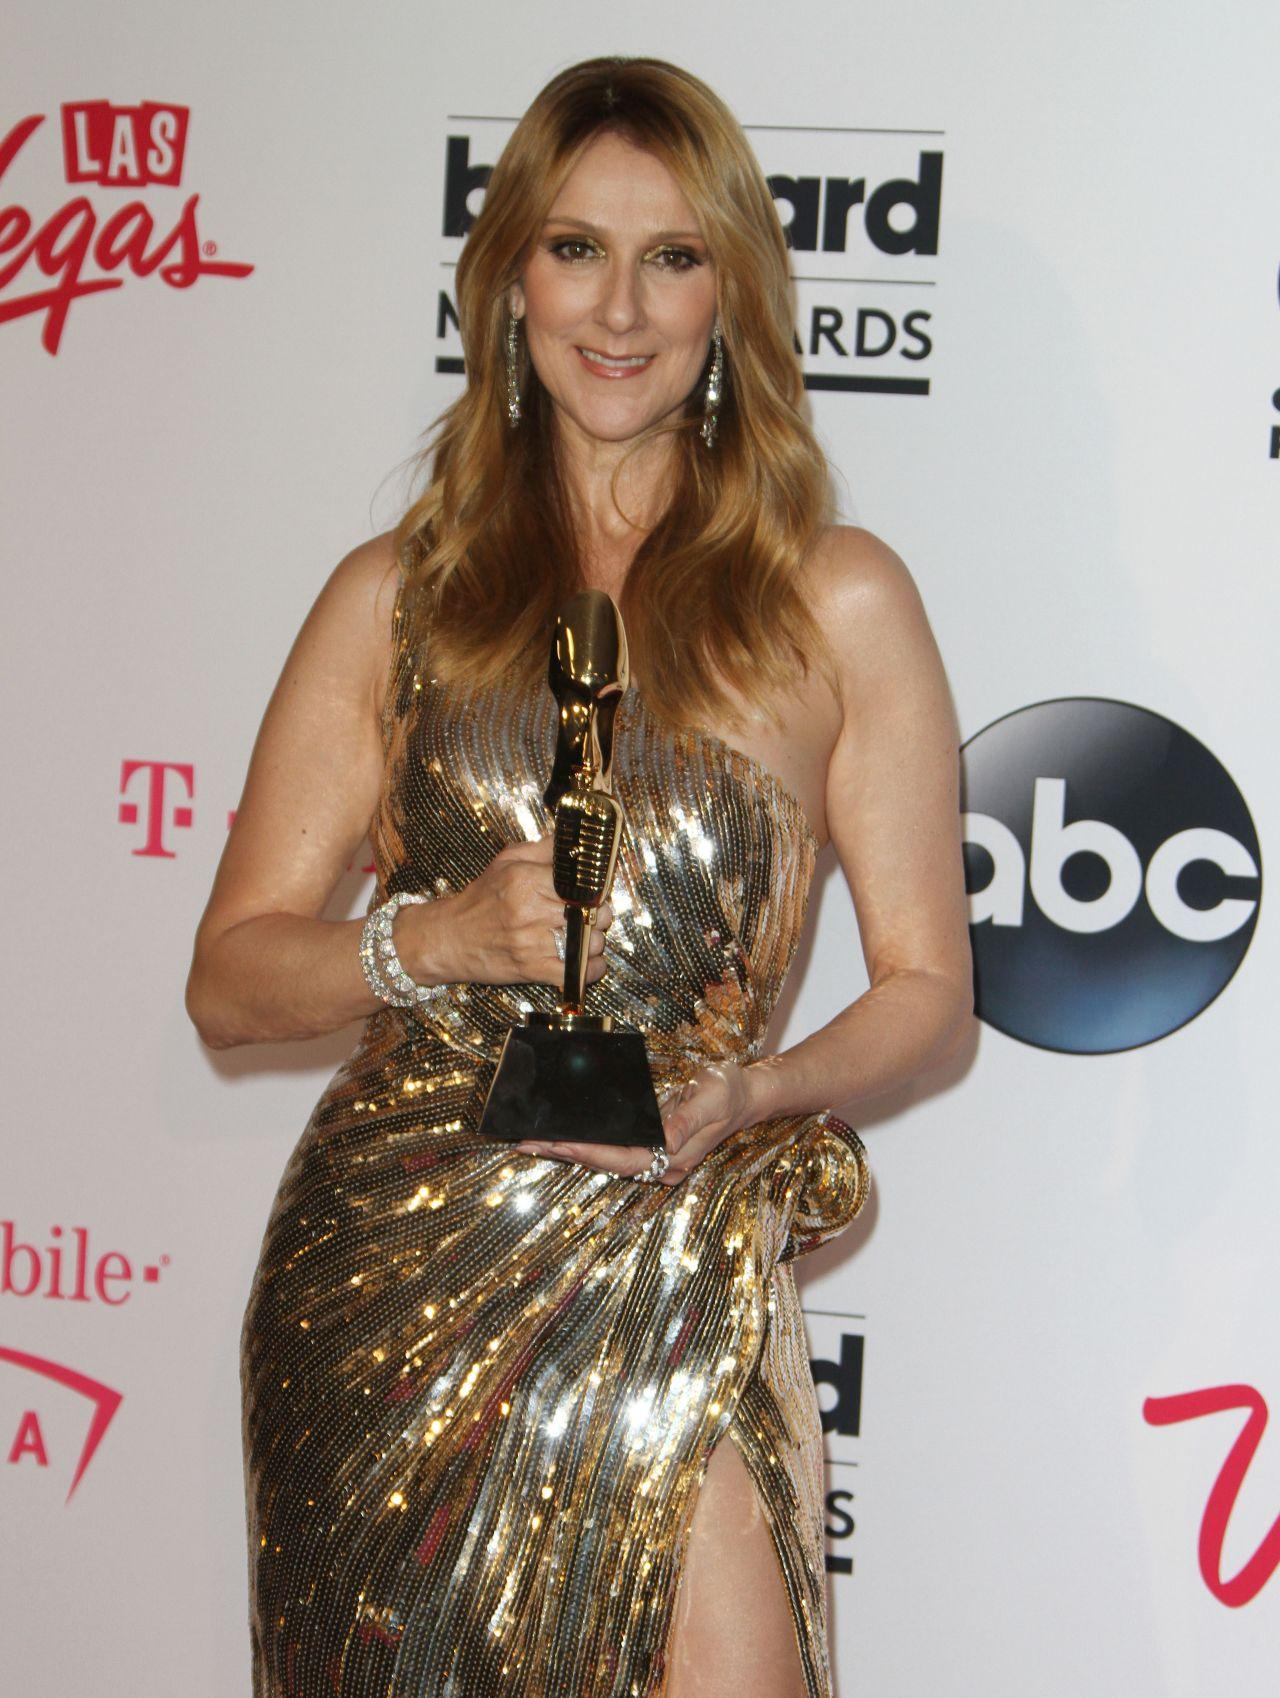 Celine Dion 2016 Billboard Music Awards In Las Vegas Nv